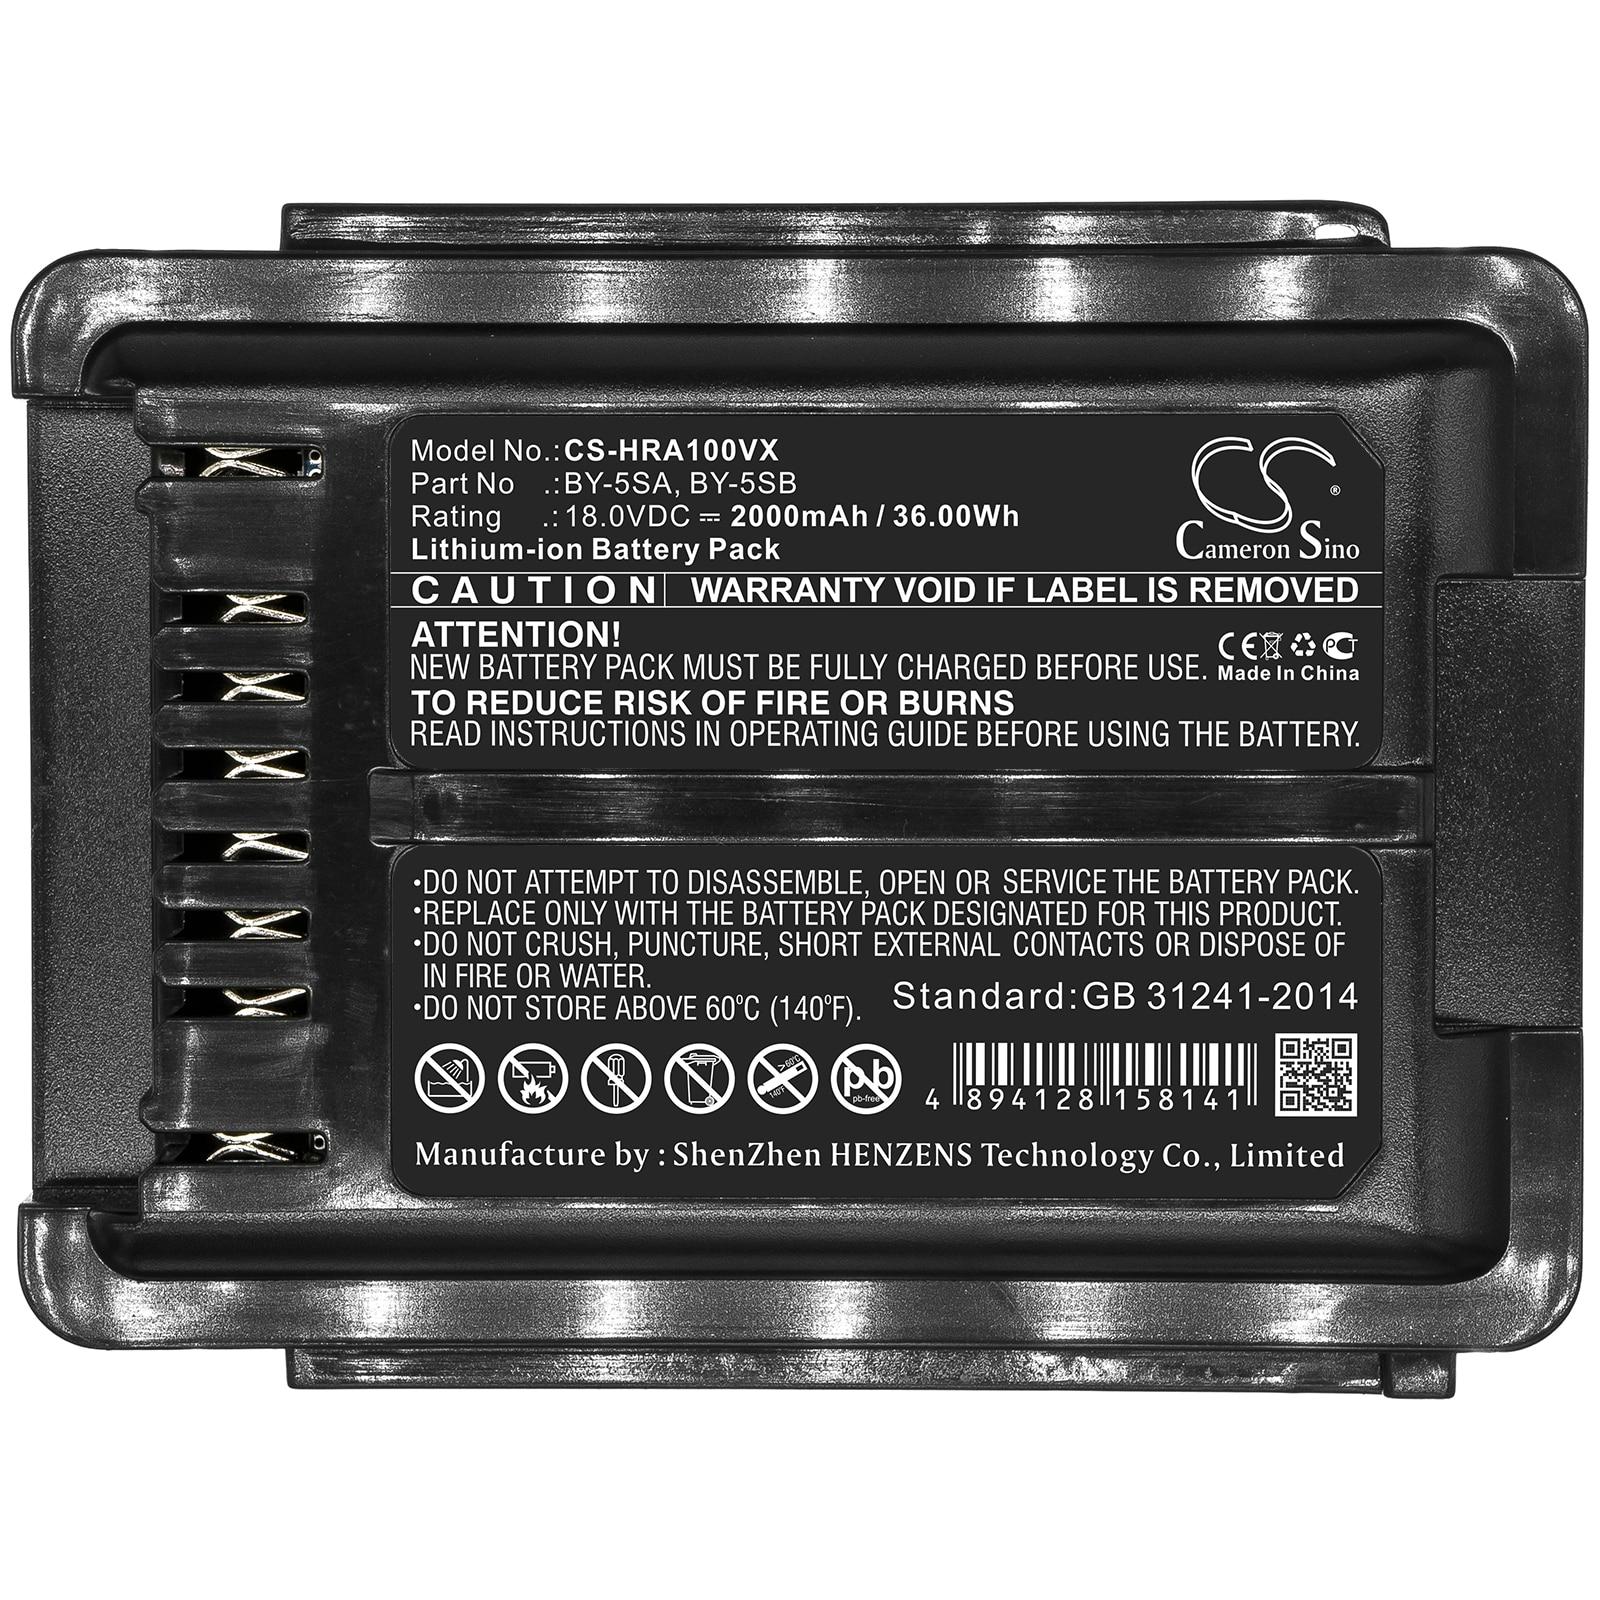 Generic بطارية 2000mA لشارب EC-SX210-P ، EC-SX310 ، EC-SX310-N ، EC-SX310-R ، EC-SX320 ، EC-SX320-A ، BY-5SA ، BY-5SB